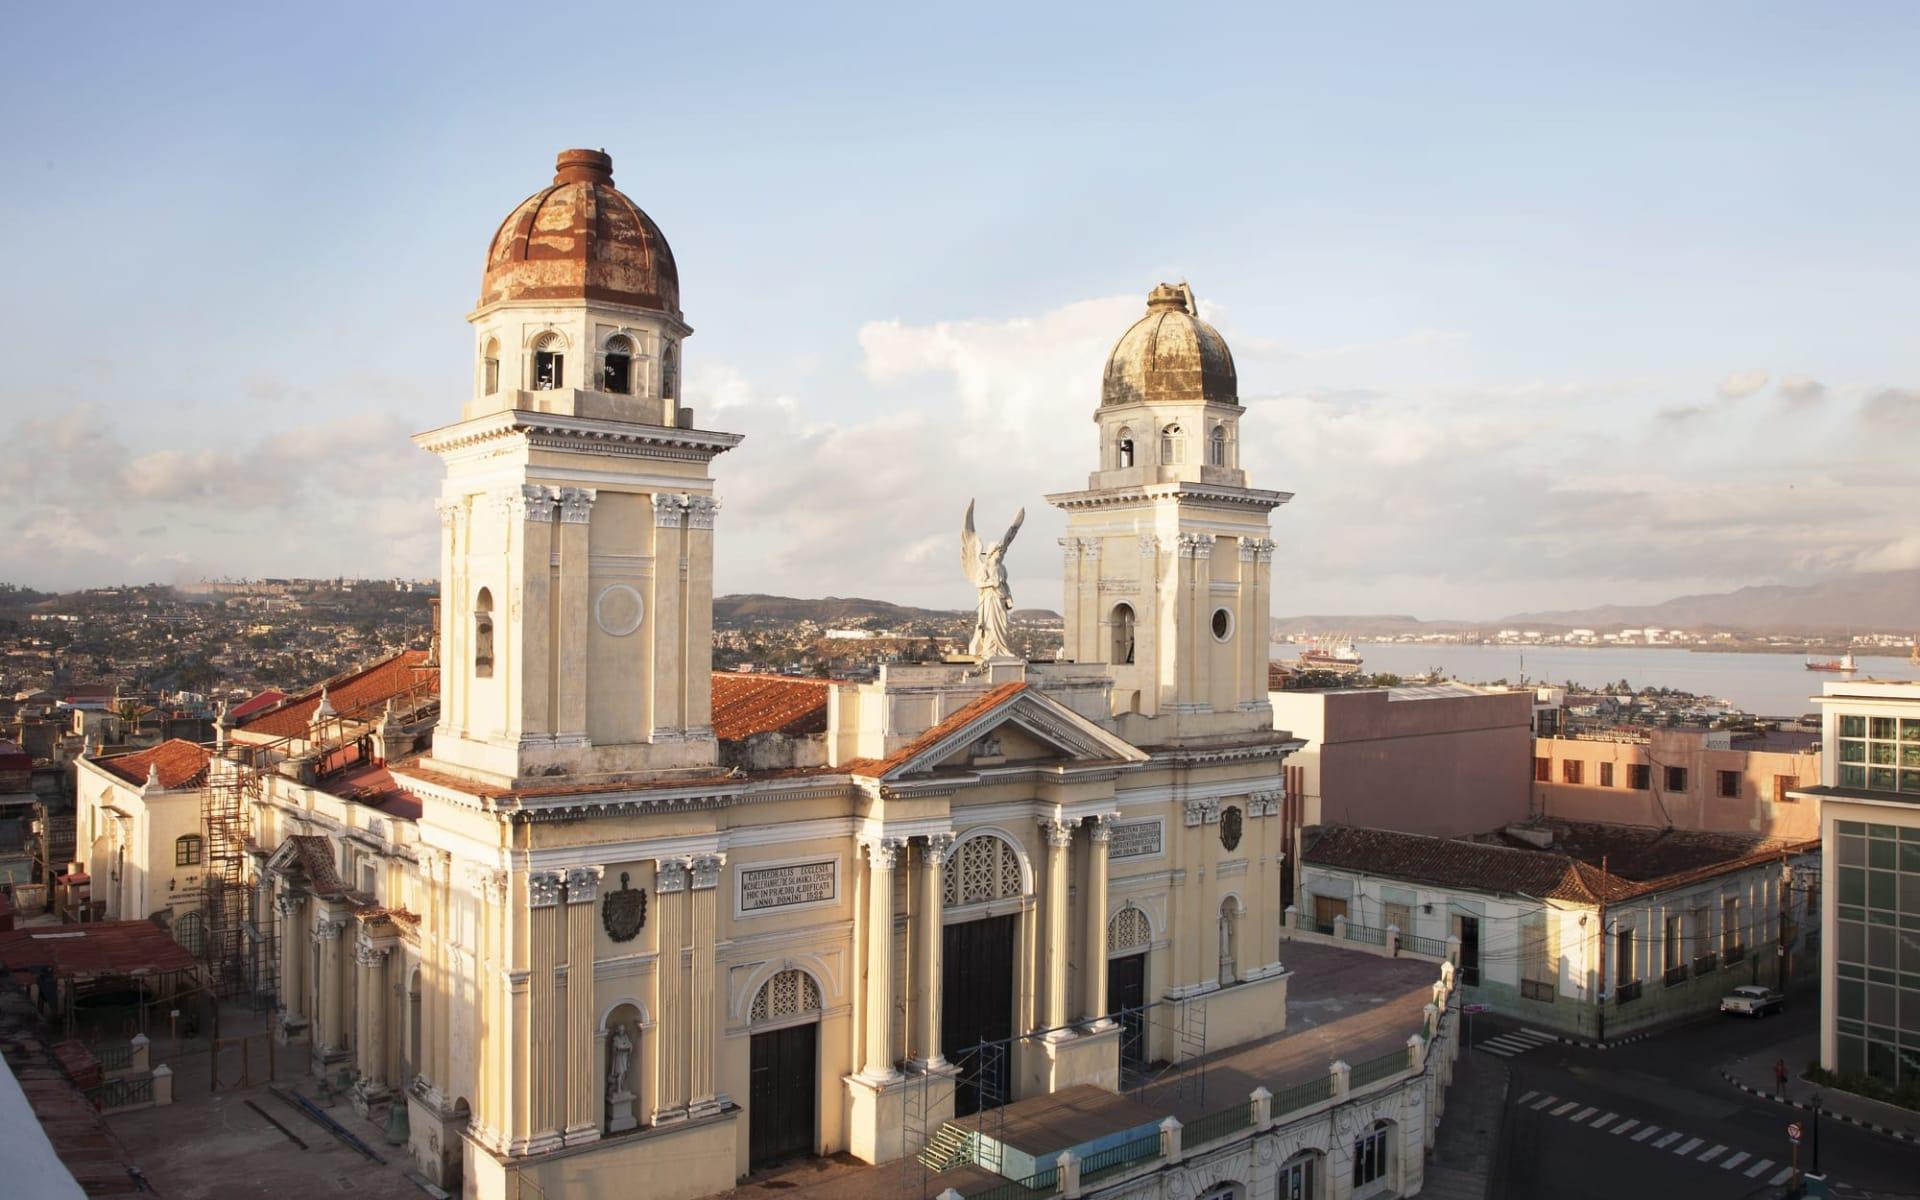 Cuba von West nach Ost ab Havanna: activities: Stadt Santiago de Cuba - Kuba Kirche C